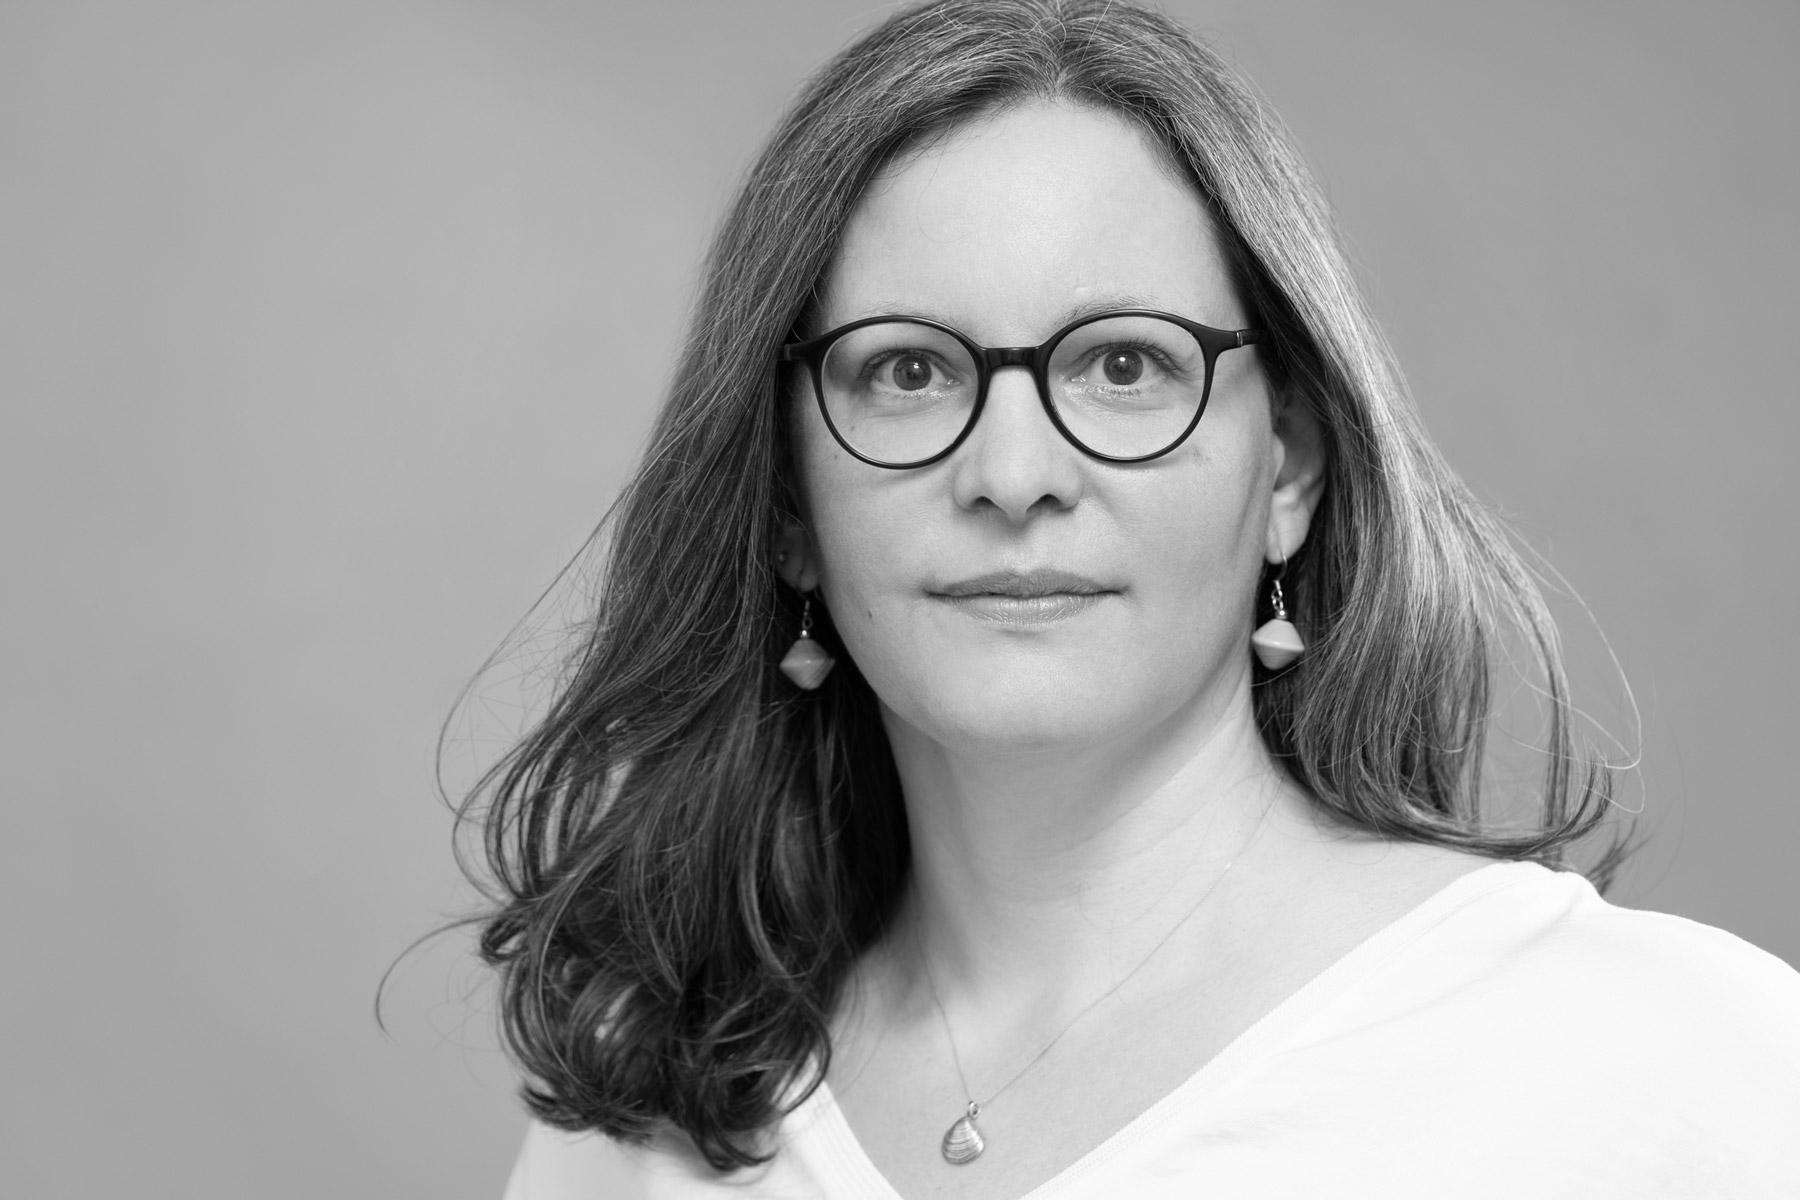 Businessportrait-Weltfrauentag-c-lisalux2020